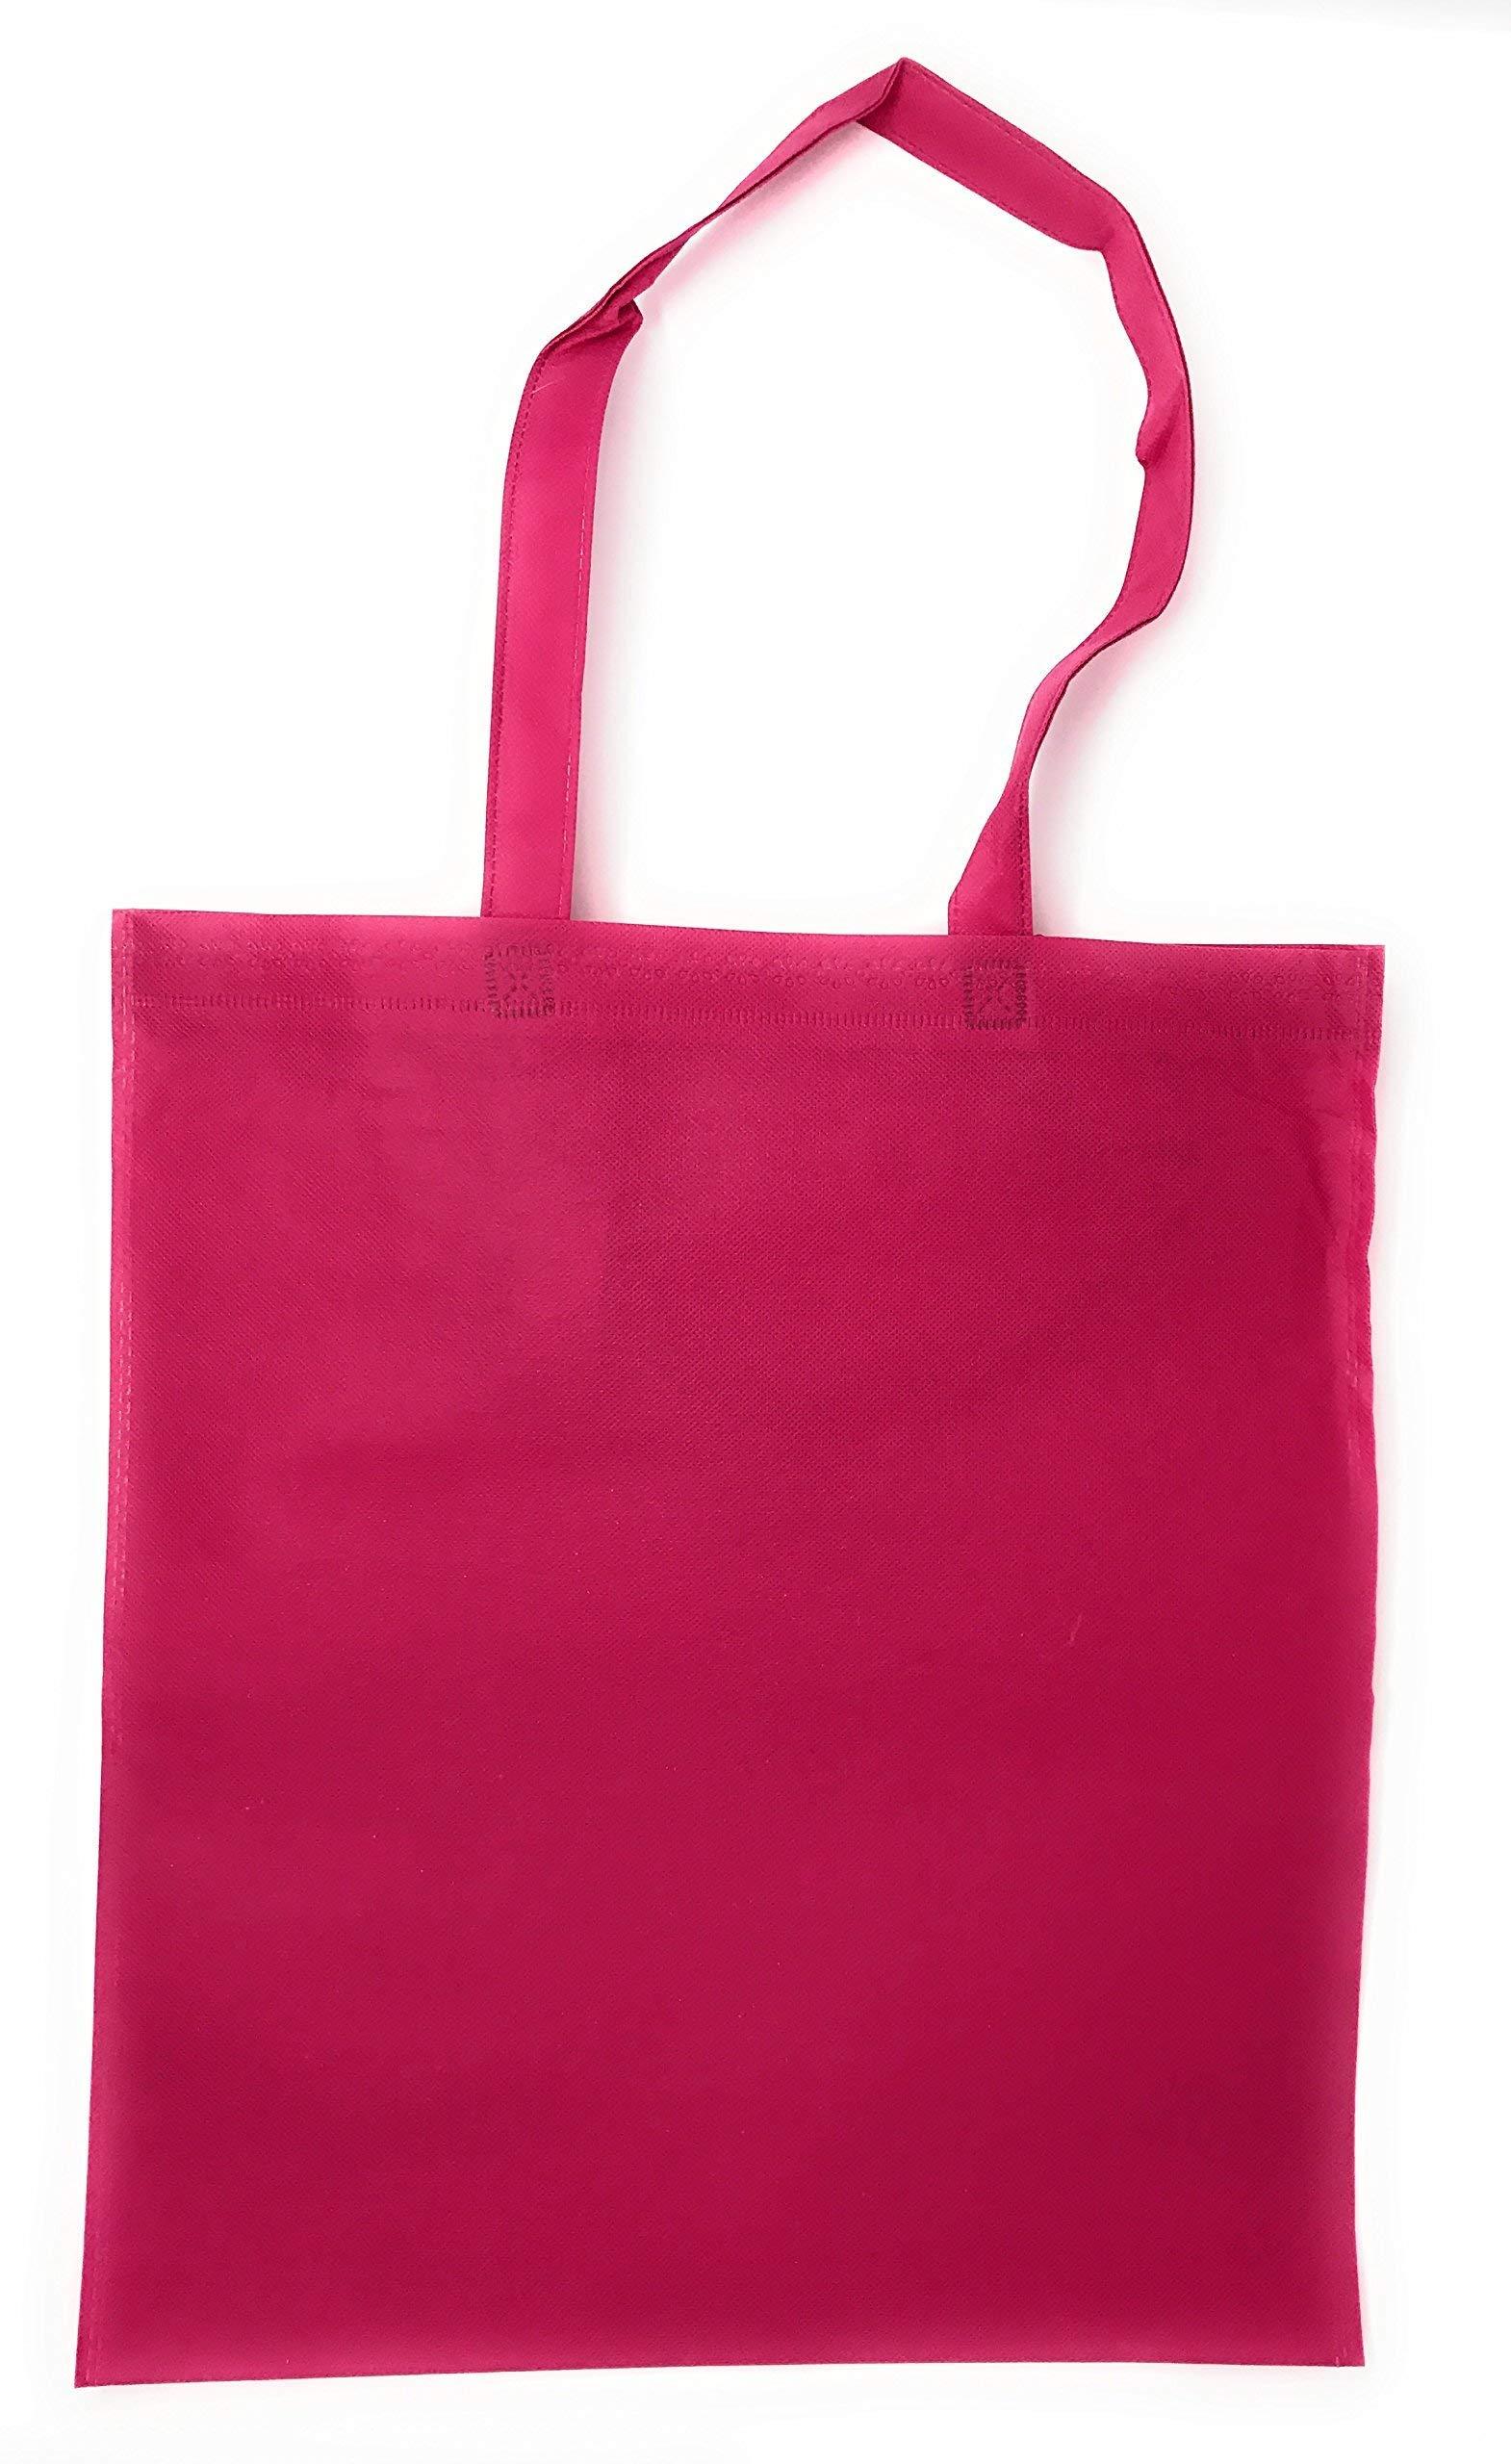 50 Bulk Large Tote Bag Mega Pack - 15'' x 16'' Reusable Shopping Bags (Multicolor)